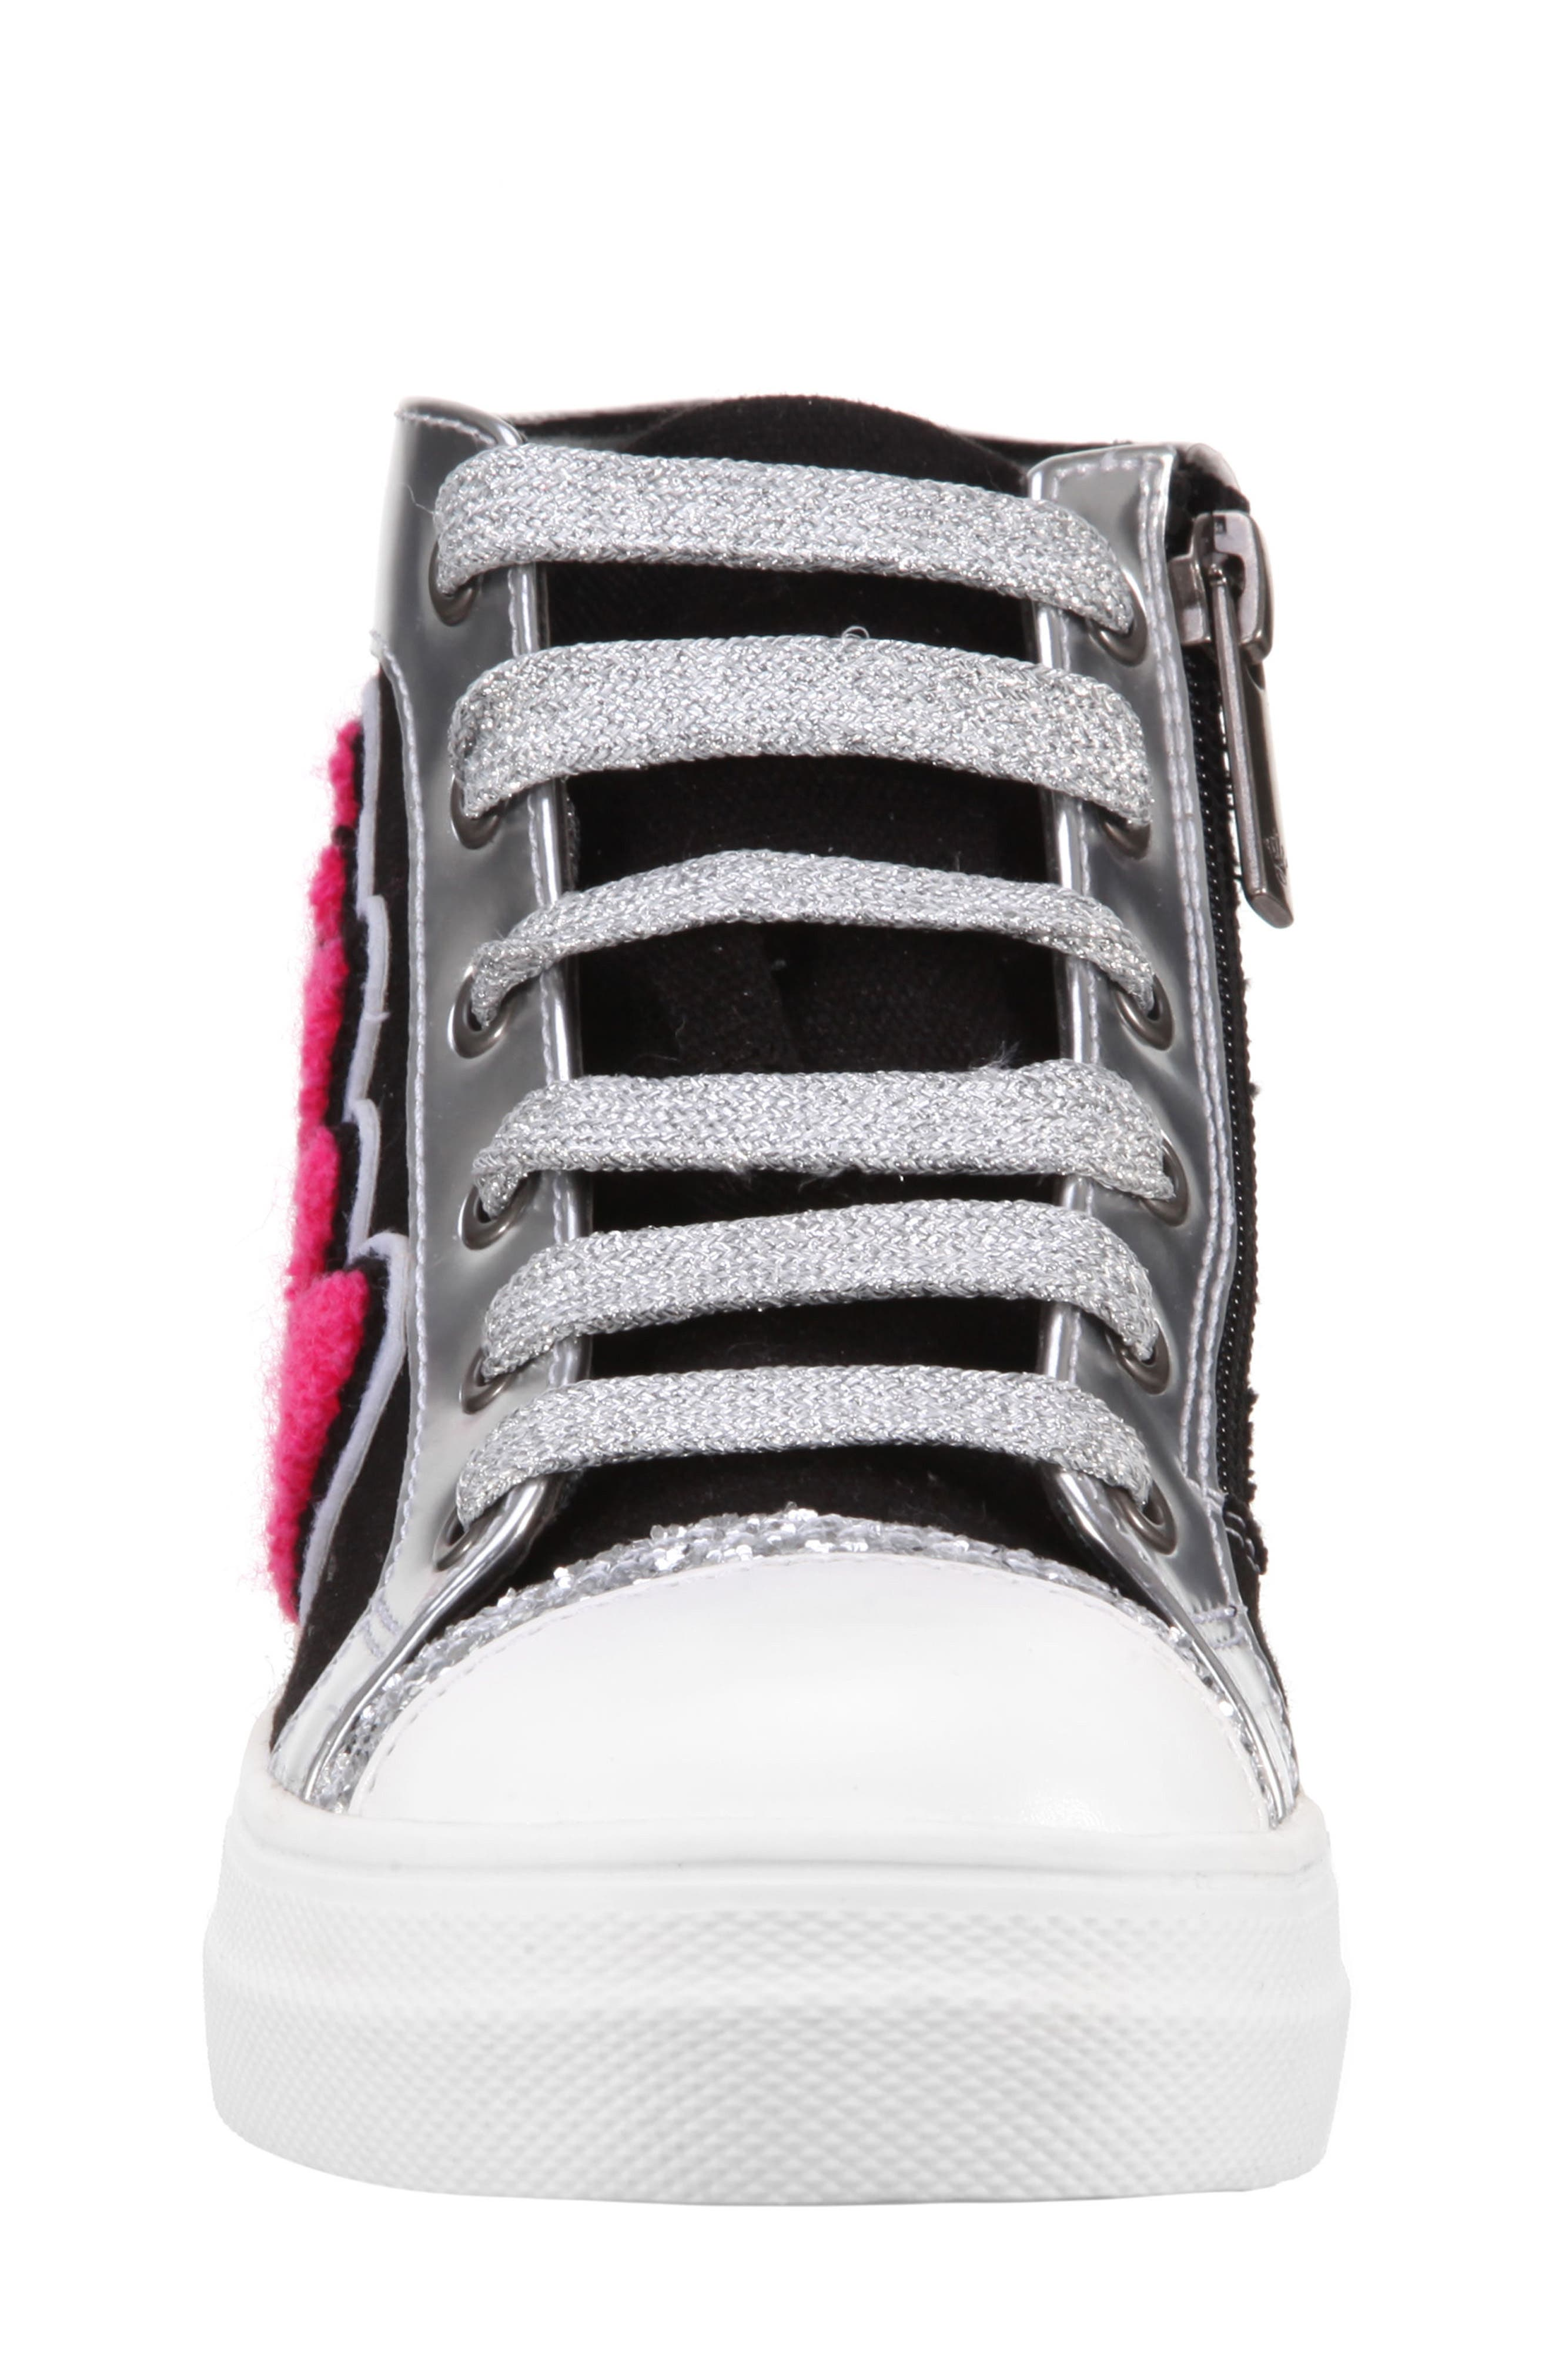 Gita High Top Sneaker,                             Alternate thumbnail 4, color,                             009